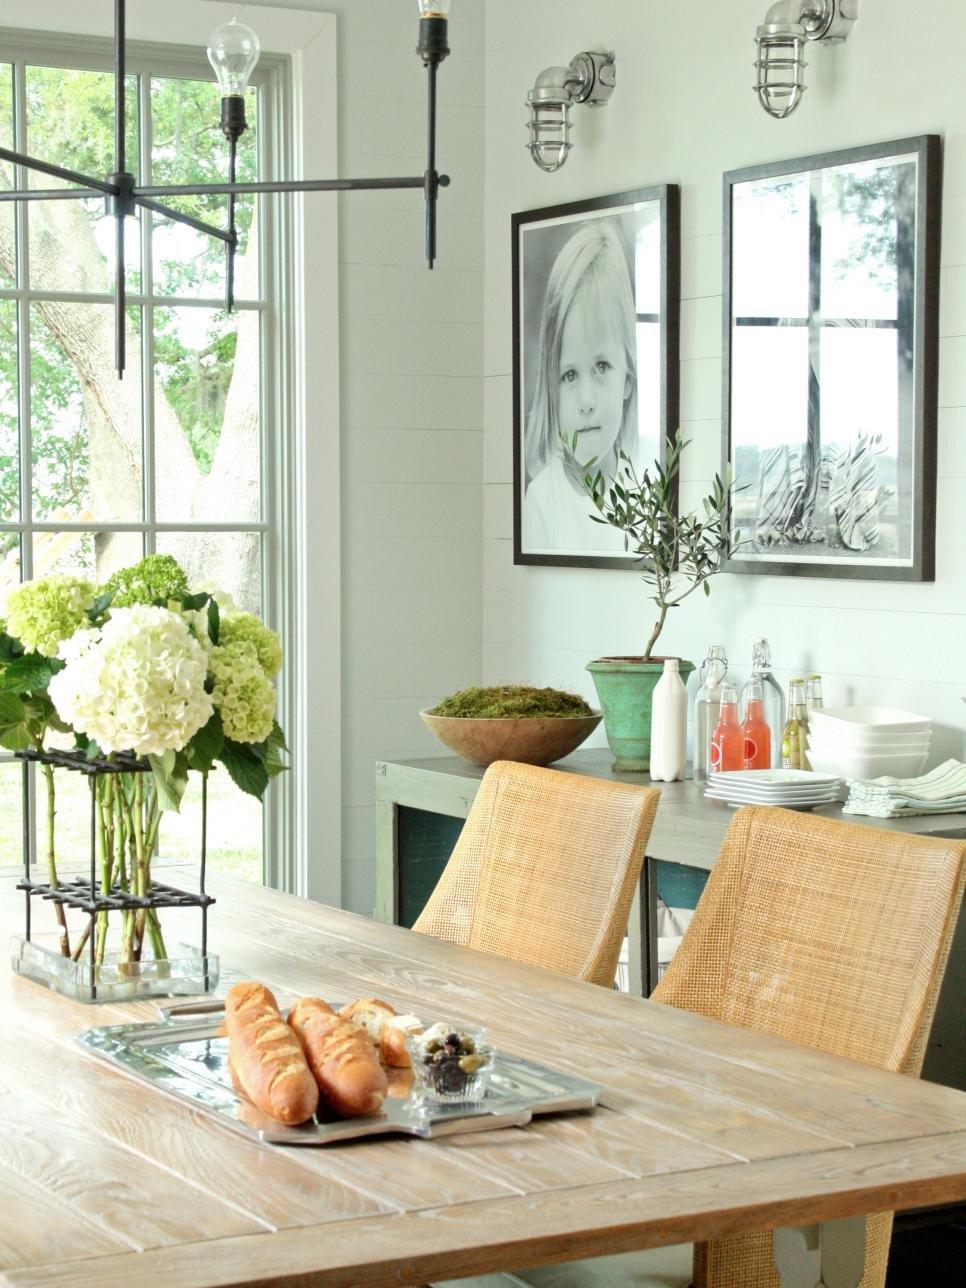 Modern Living Dining Room Decorating Ideas 15 Dining Room Decorating Ideas